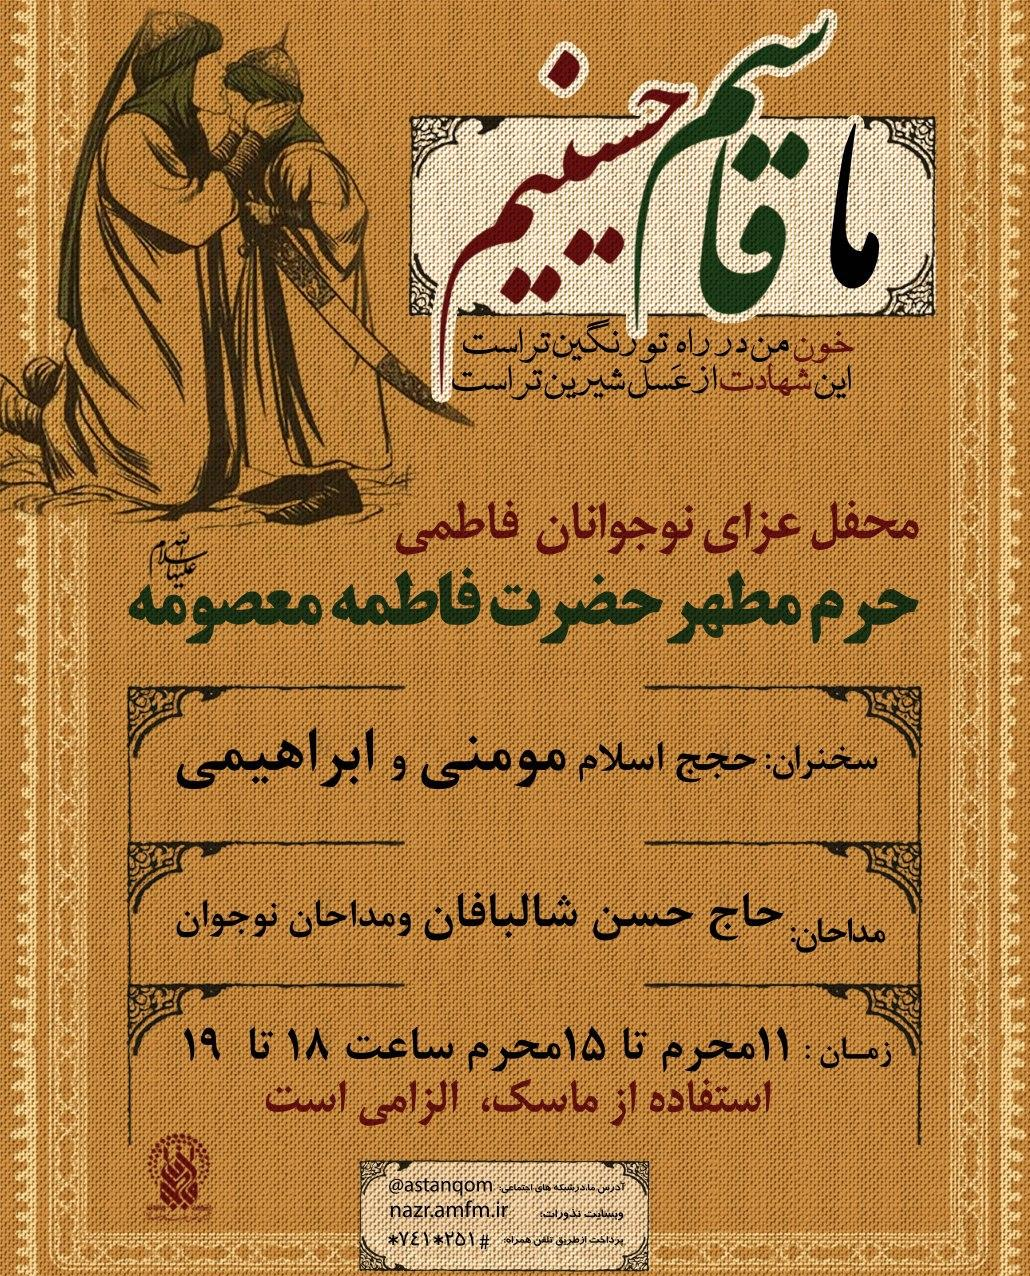 13990609000229 Test NewPhotoFree - محفل عزای نوجوانان فاطمی در حرم حضرت معصومه برگزار میشود